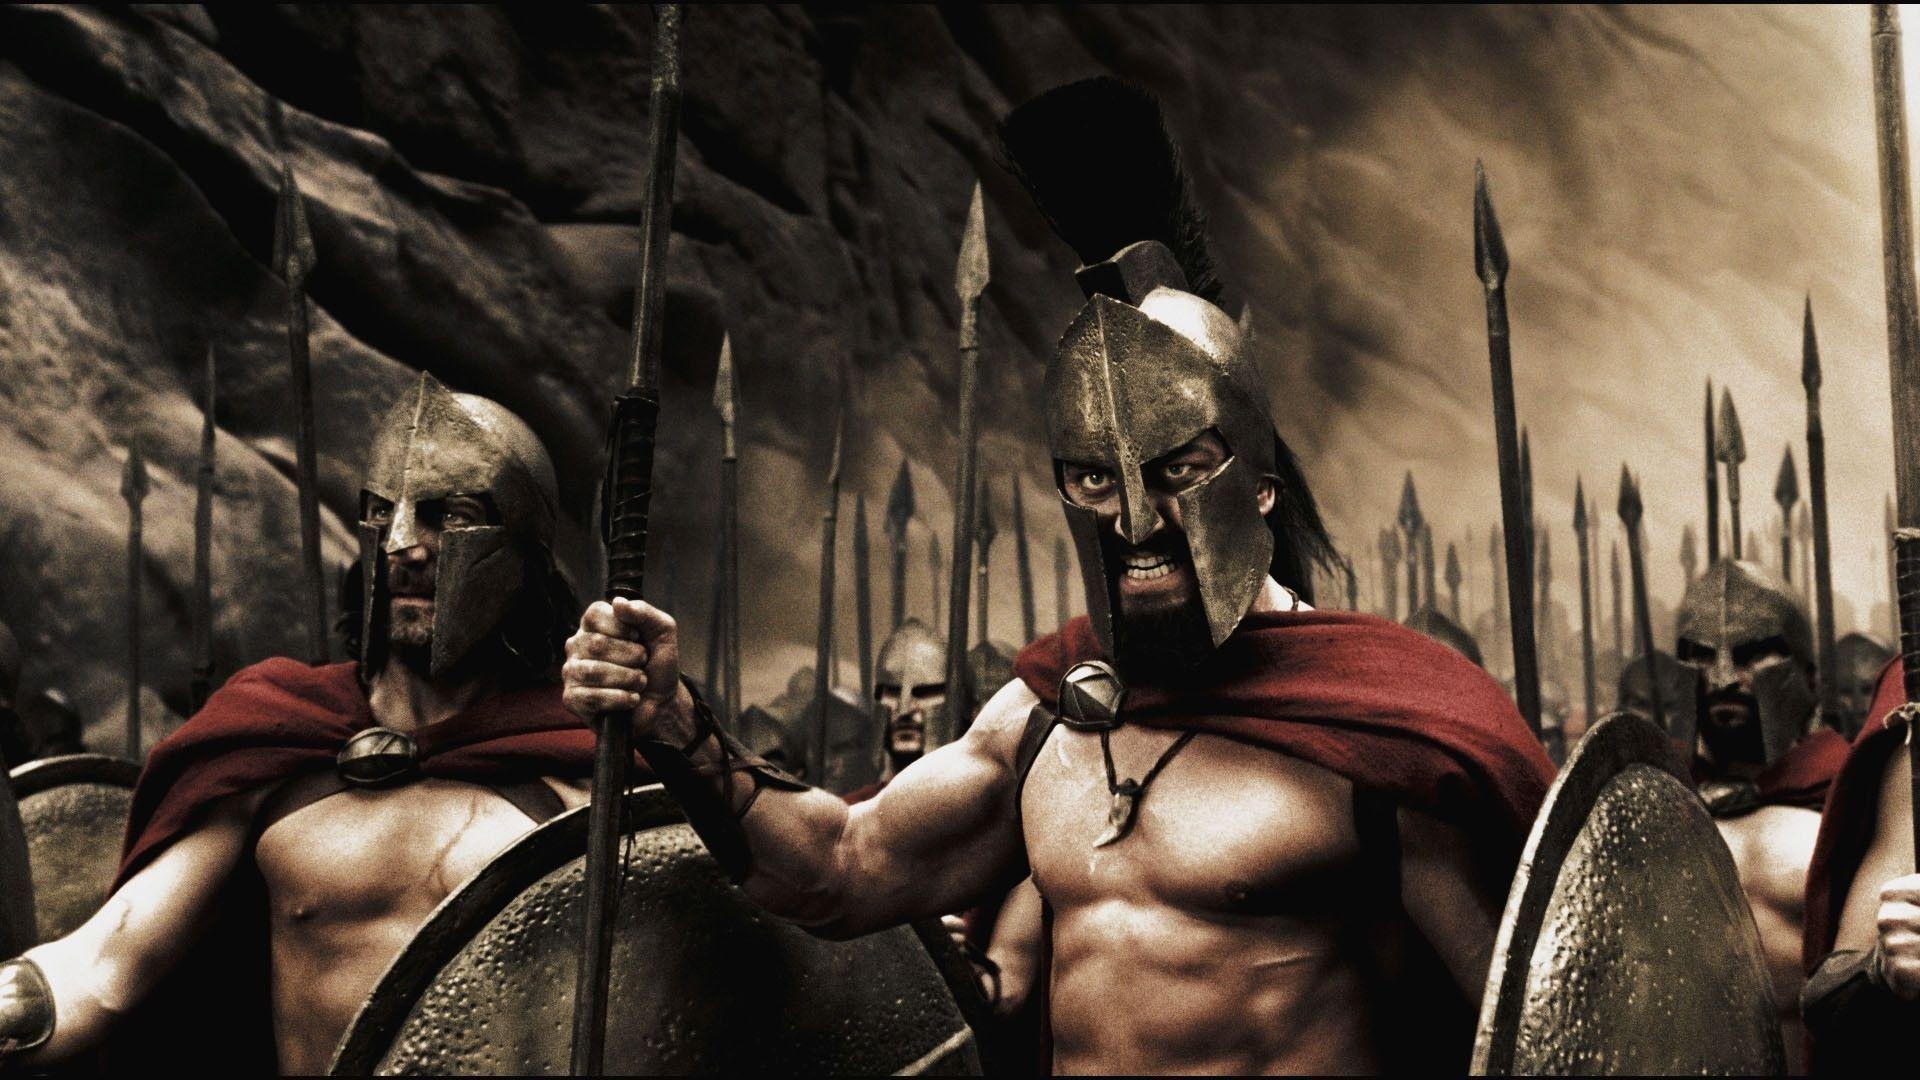 Wallpapers For > Spartan Warrior 300 Wallpaper